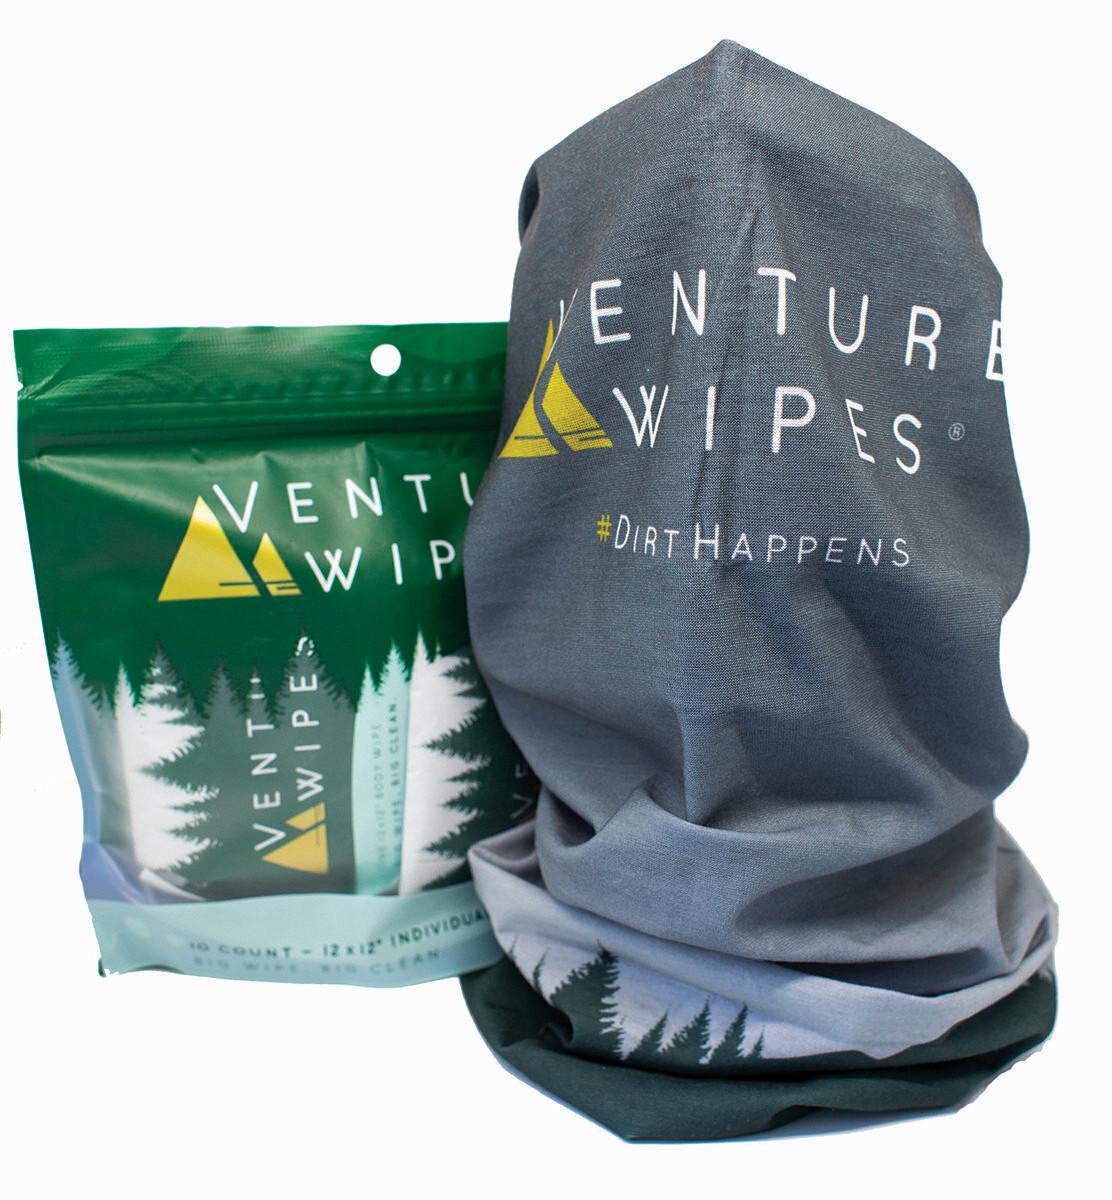 Venture Wipes Bundle 1: 10-Count & Neck Gaiter